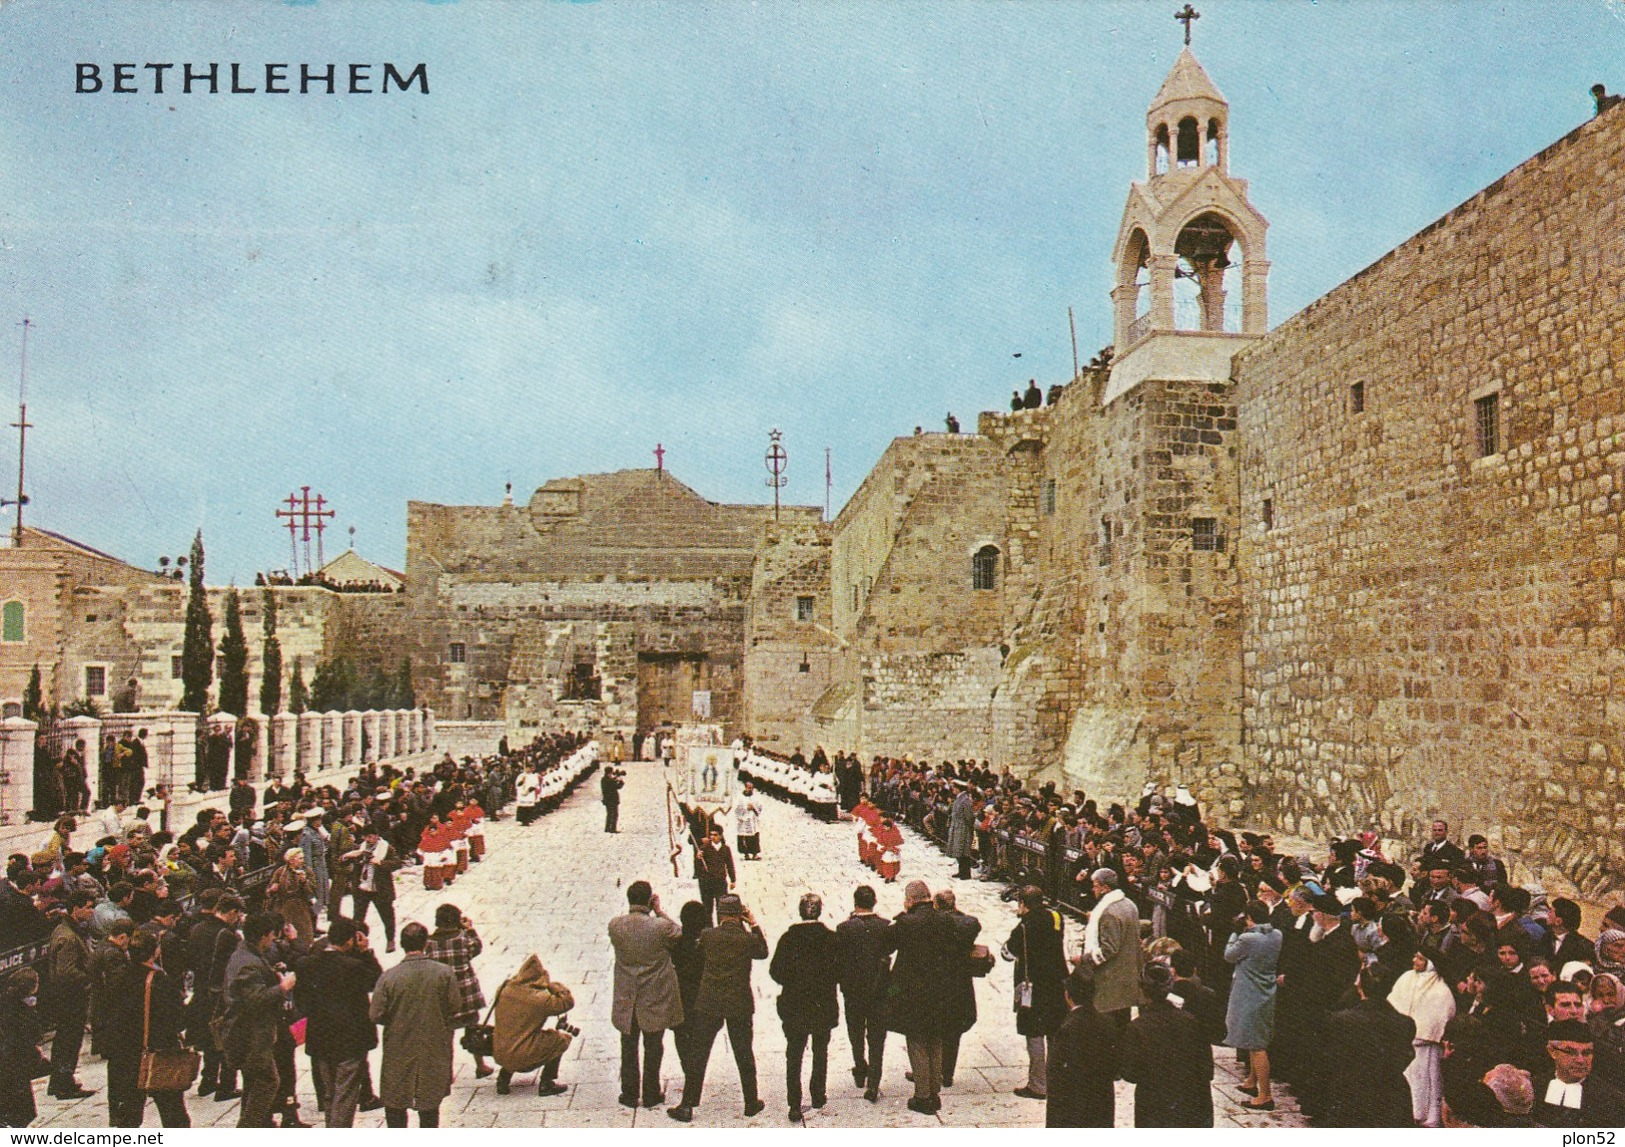 11289-BETHLEHEM-CHURCH OF NATIVITY AT CHRISTMAS PROCESSION-FG - Palestina